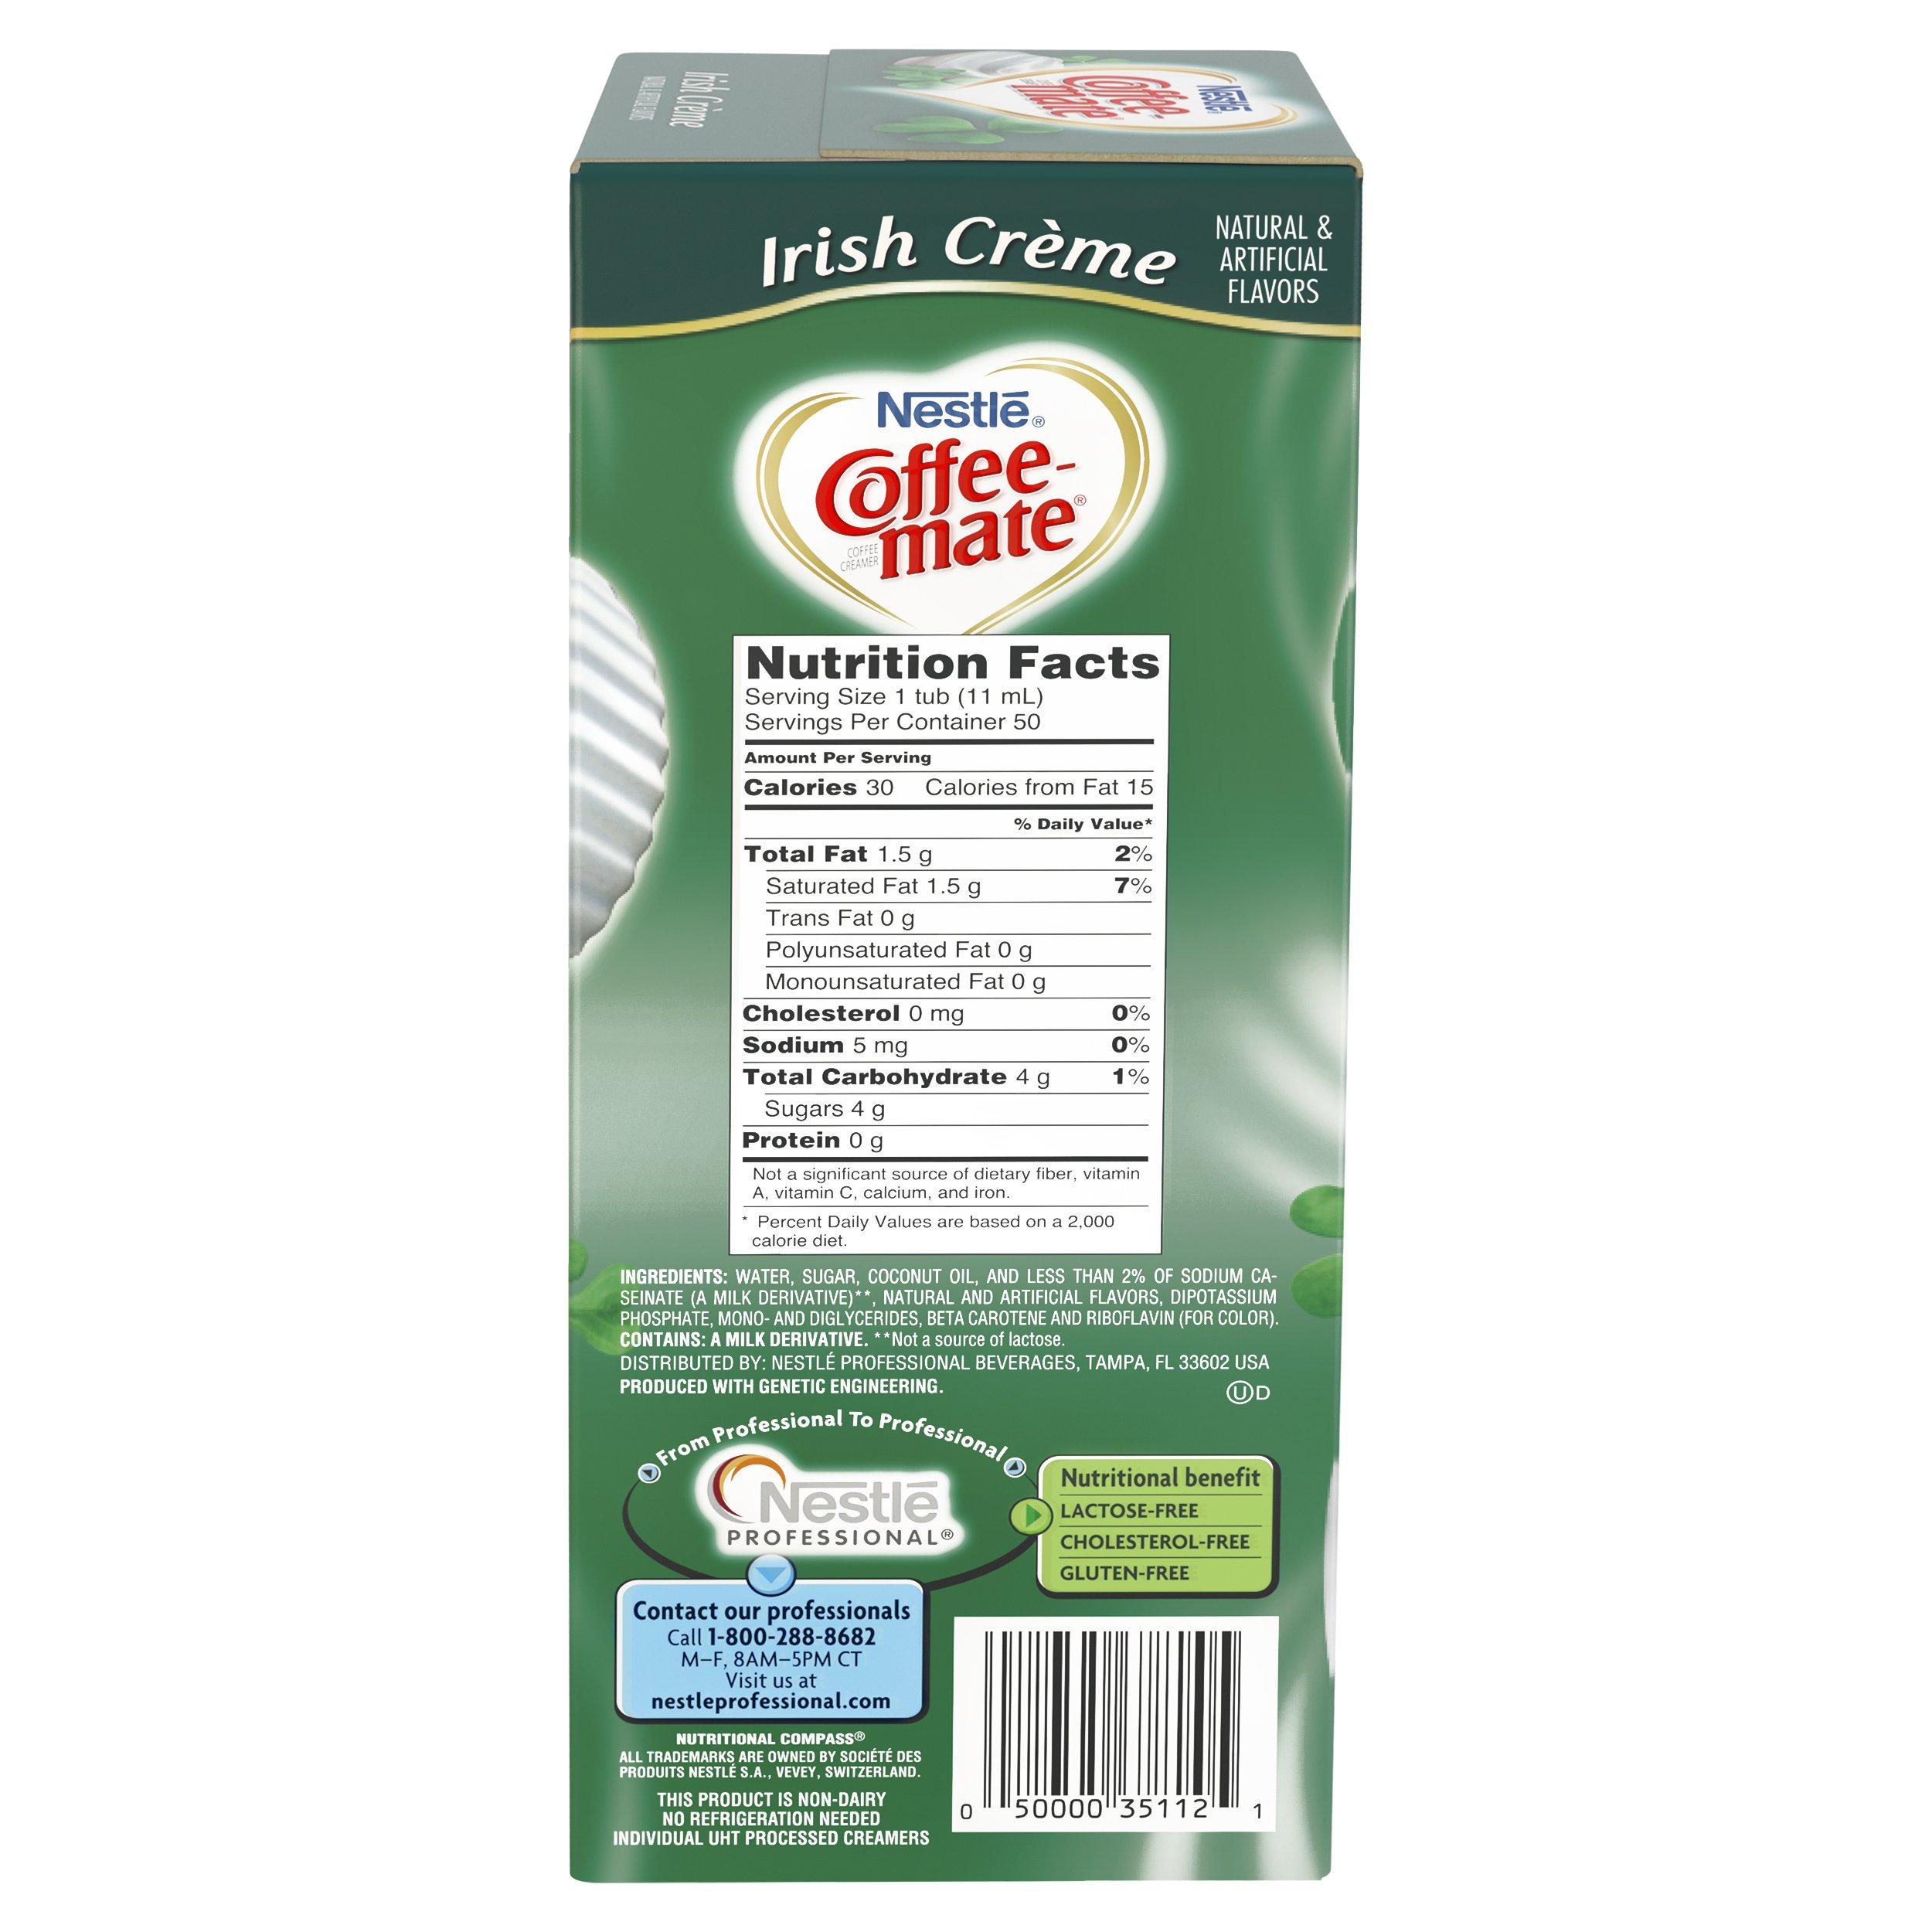 NESTLE COFFEE-MATE Coffee Creamer, Irish Creme, liquid creamer singles, 50 Count (Pack of 4) by Nestle Coffee Mate (Image #3)